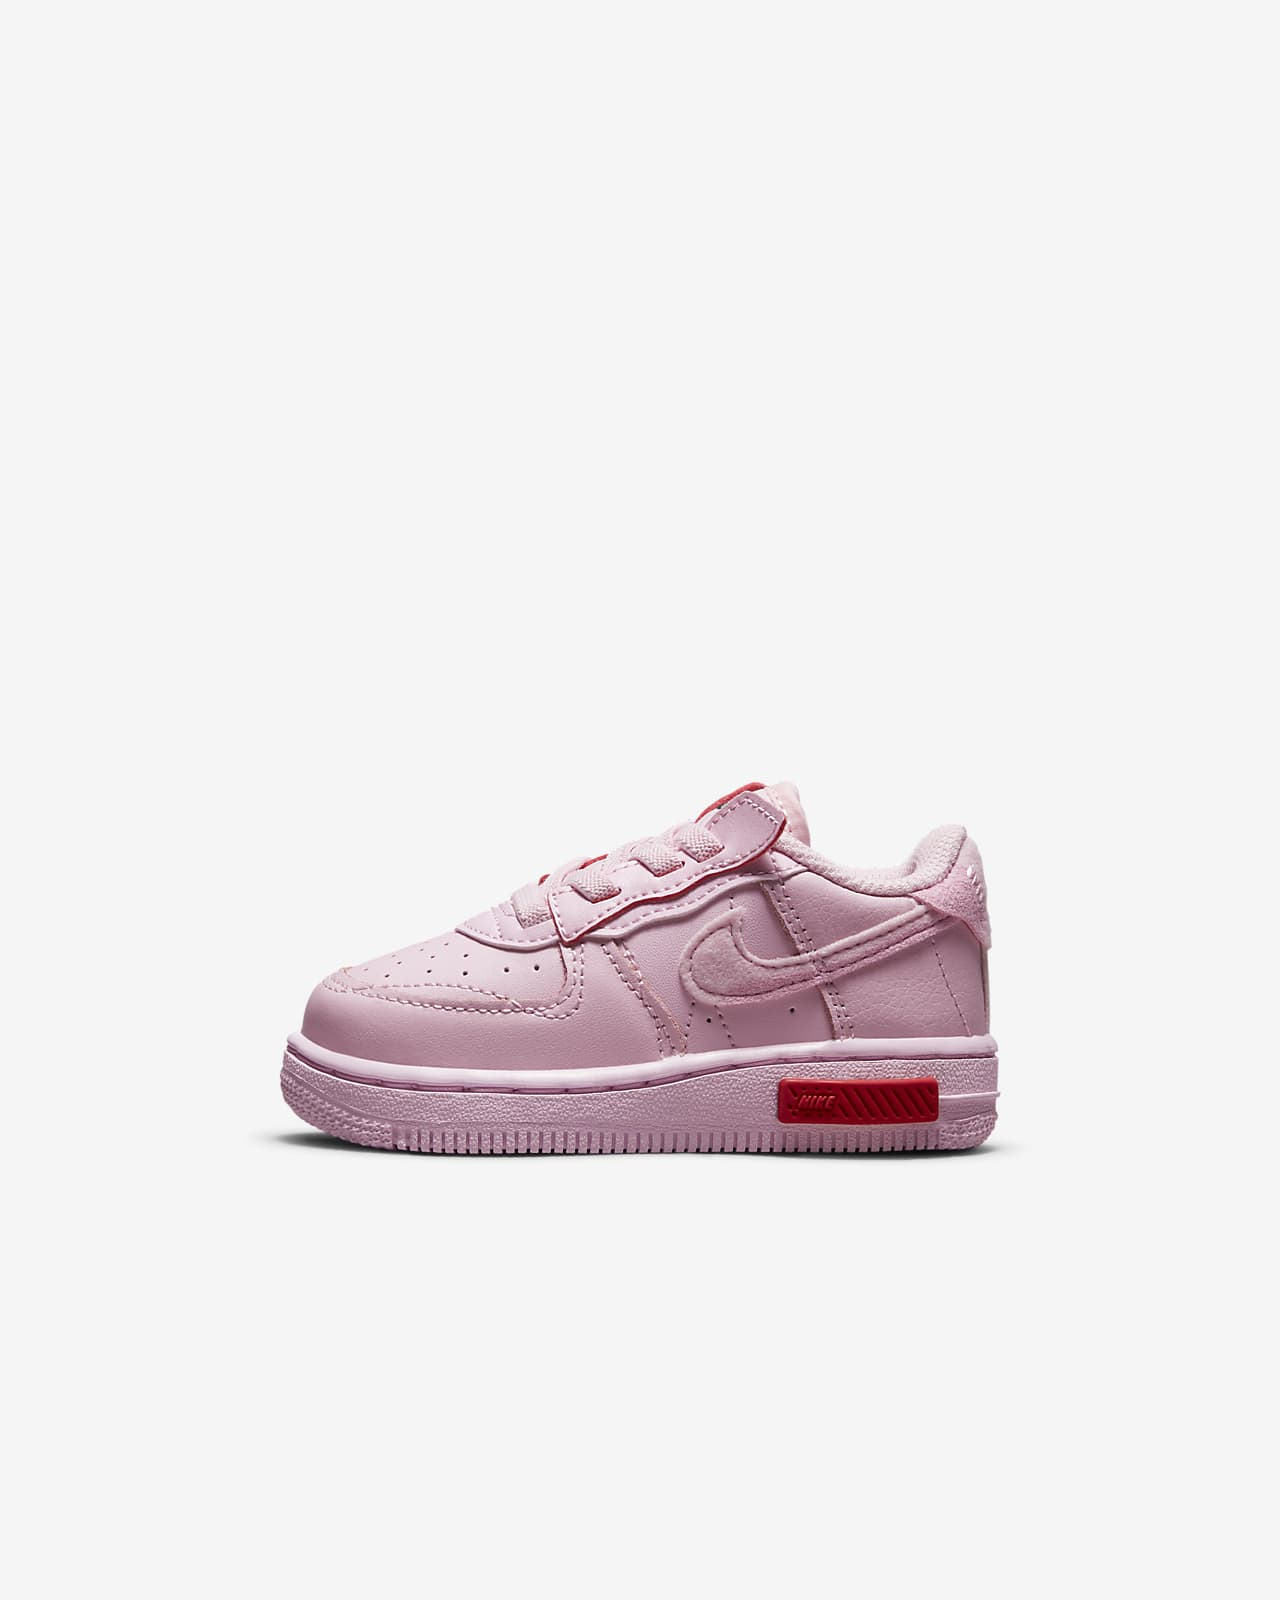 Nike Force 1 Fontanka-sko til sped-/småbarn